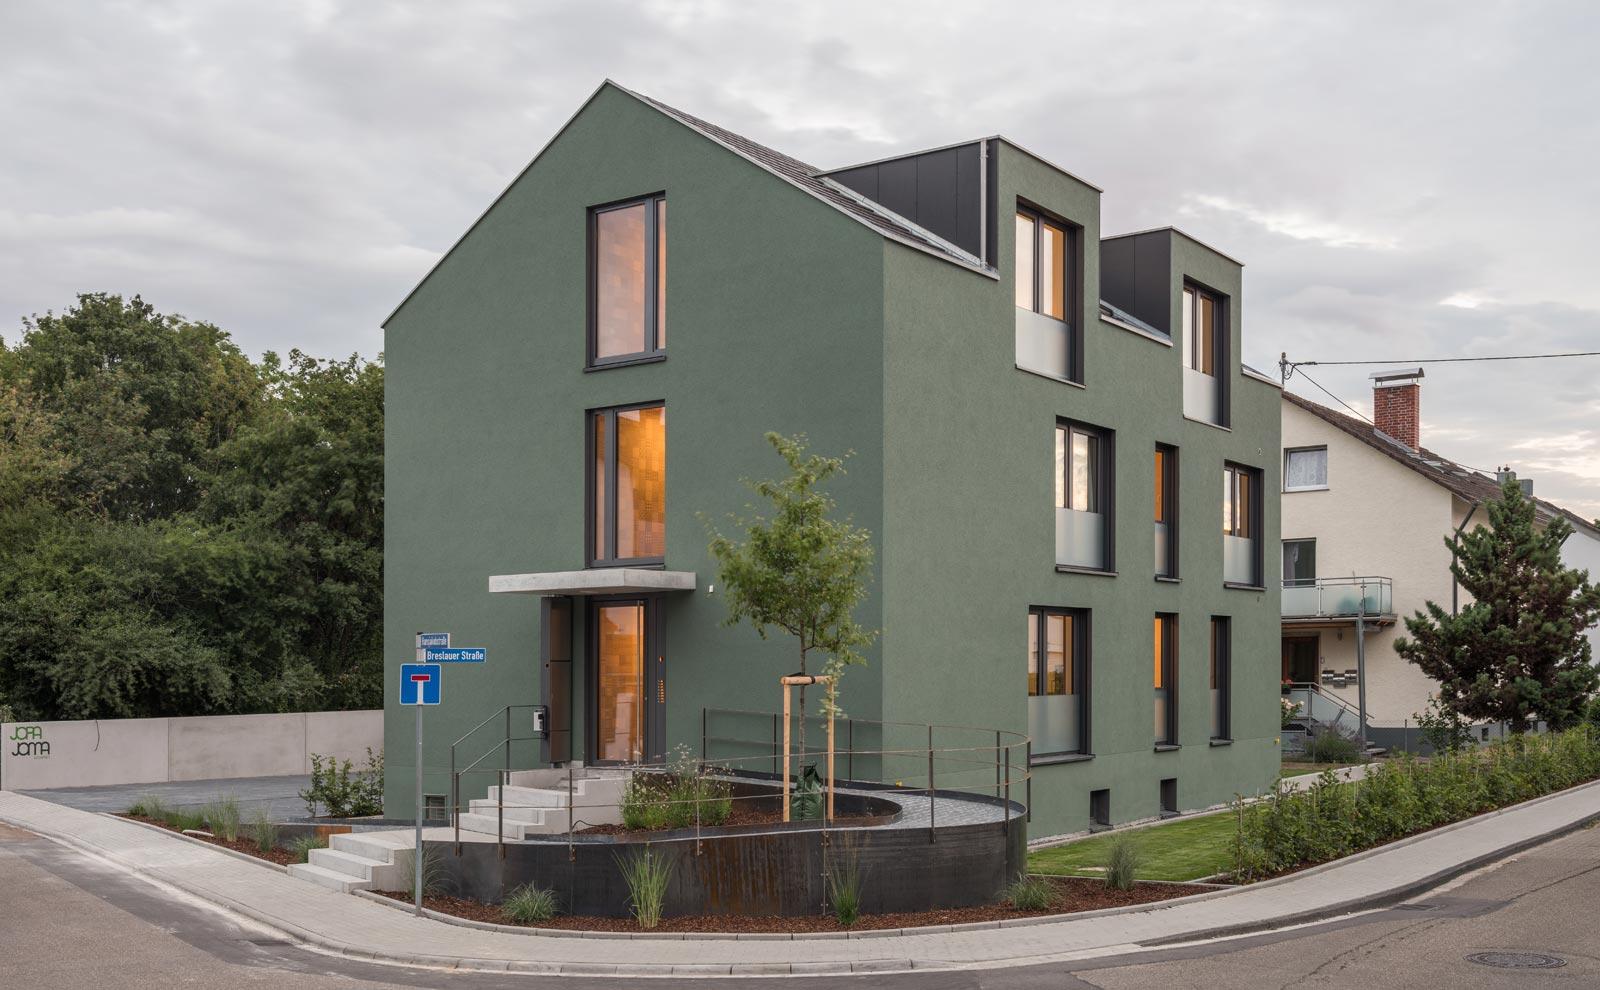 Gästehaus Jopa Joma mit grüner Fassade